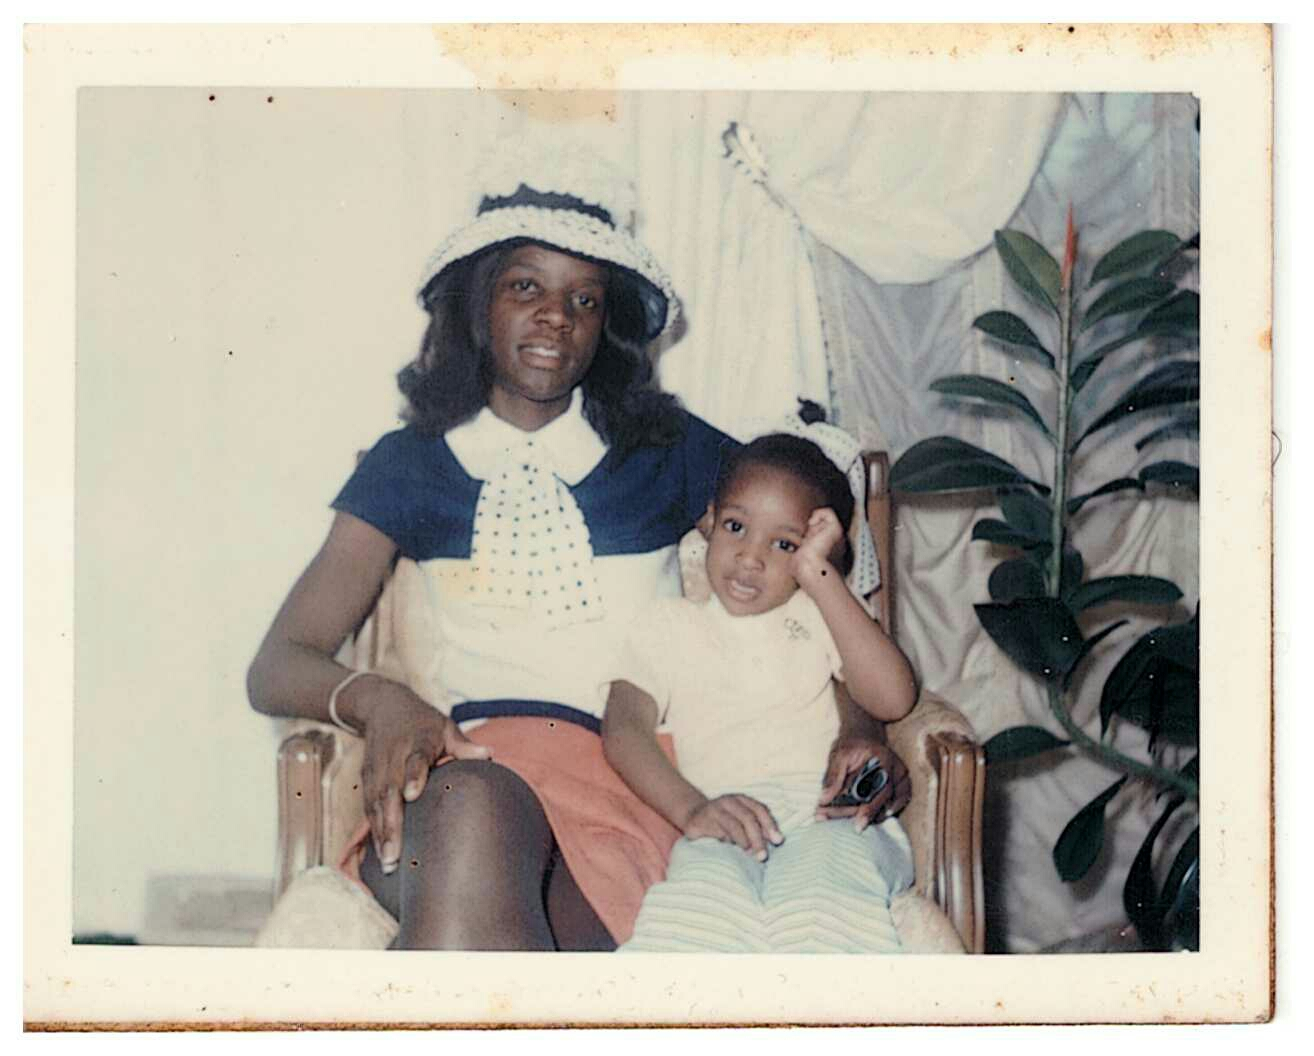 Easter, 1974